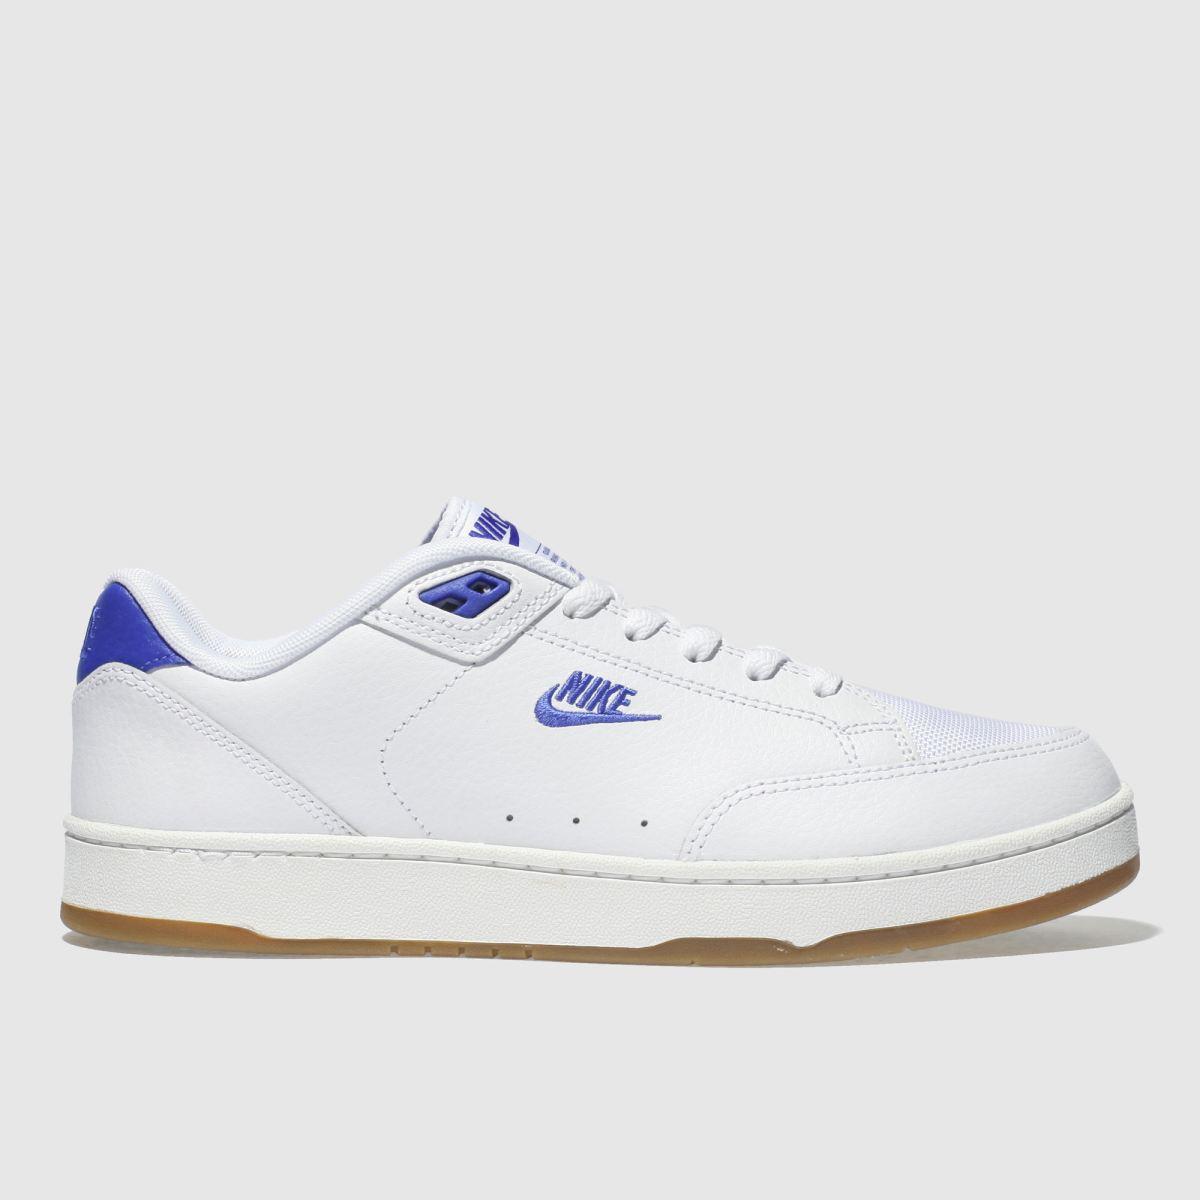 Nike White & Blue Grandstand Ii Premium Trainers